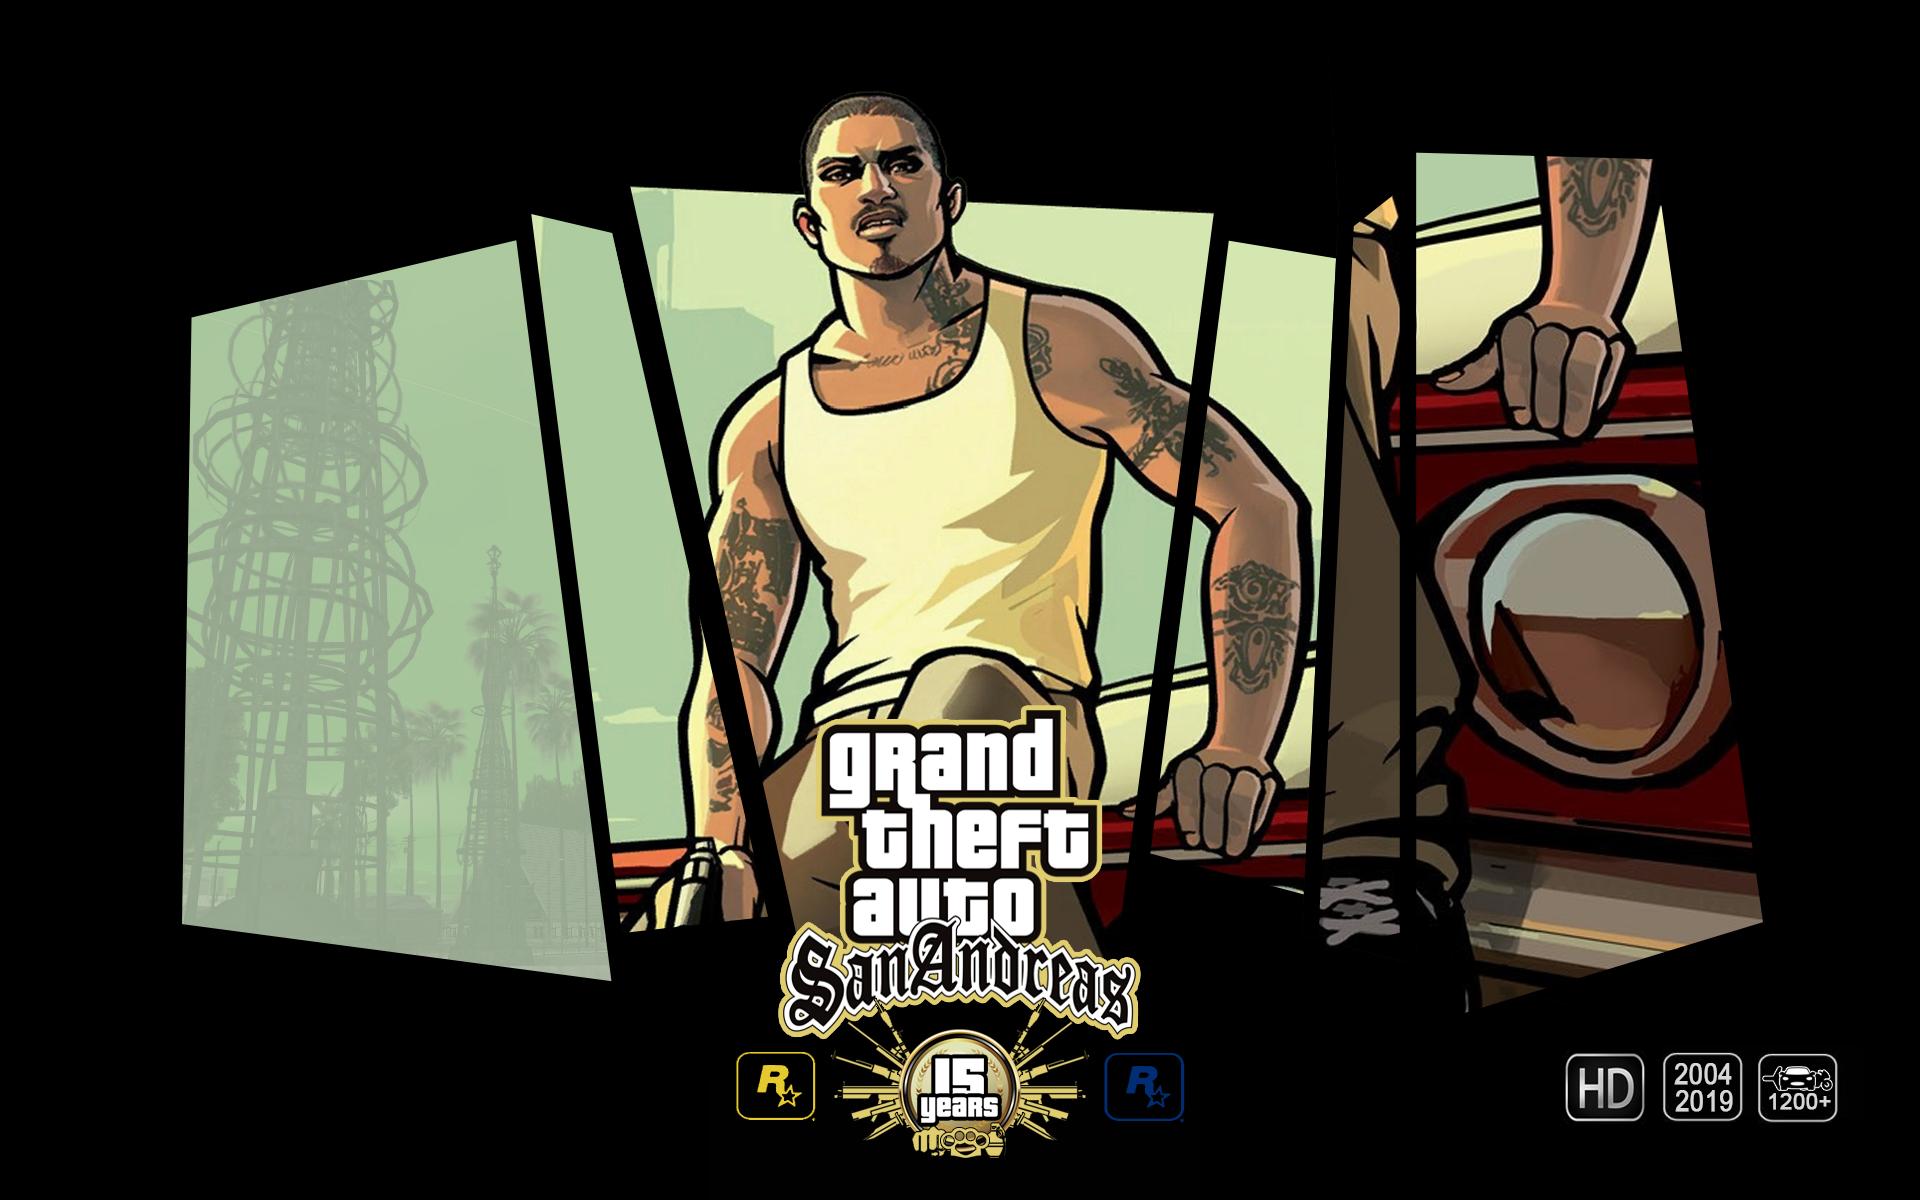 Grand Theft Auto, GTA San Andreas